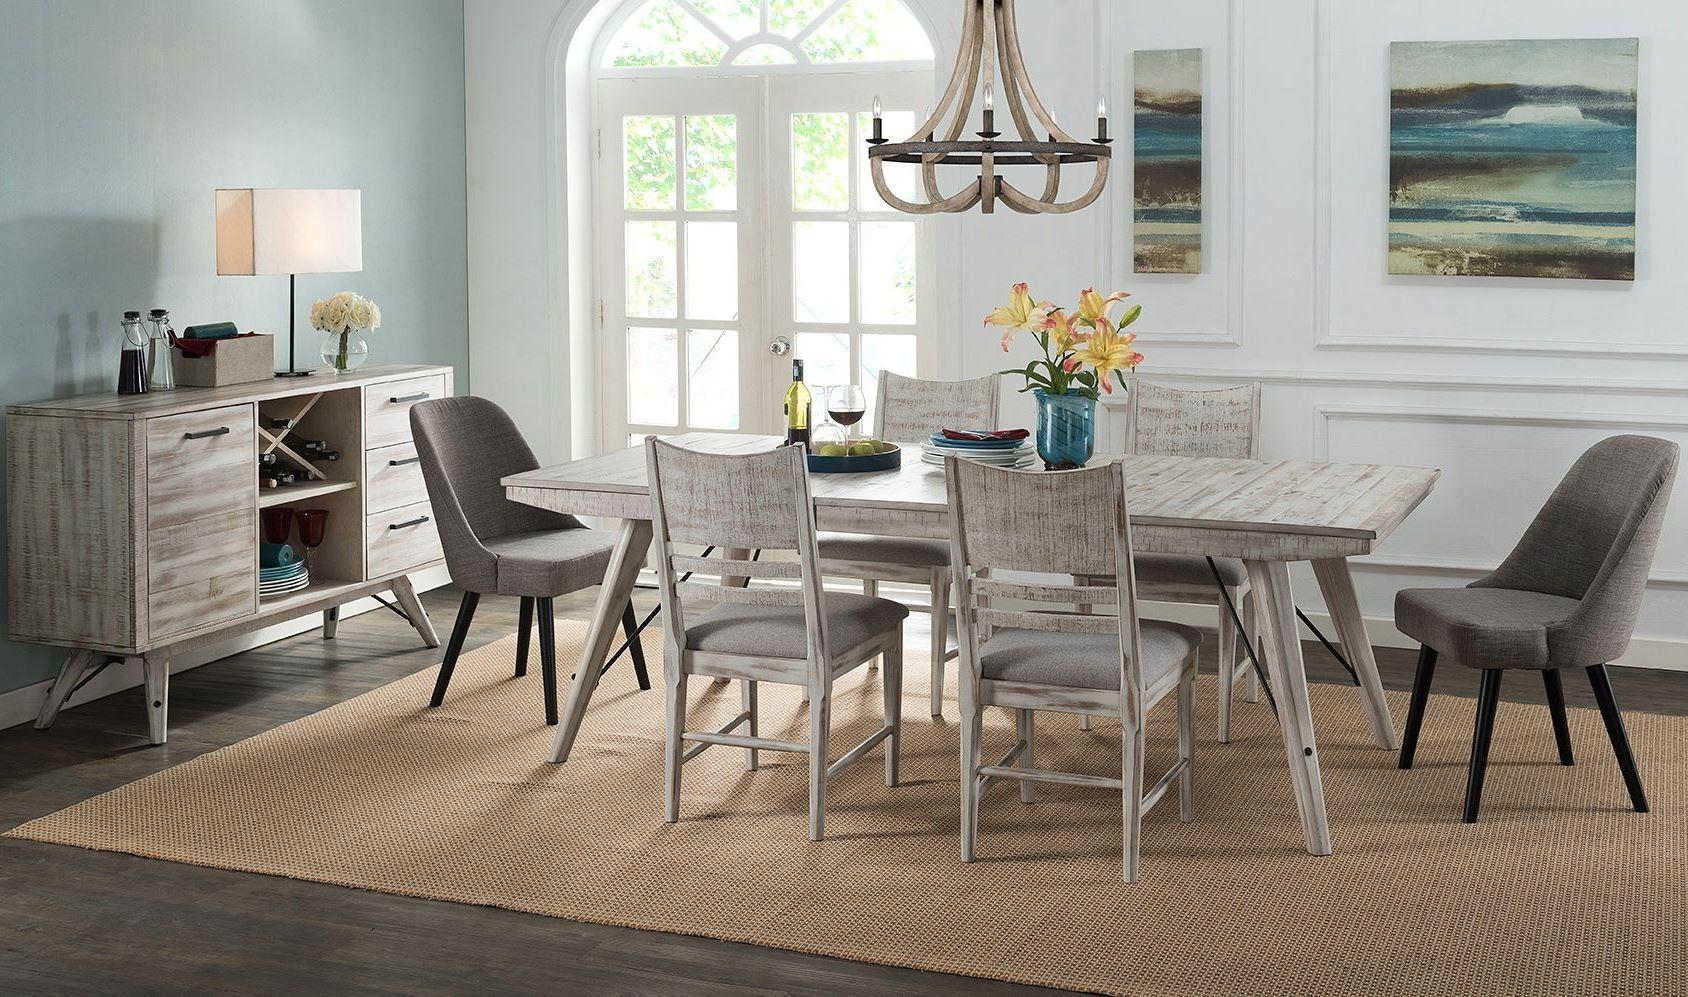 Modern Rustic Trestle Dining Room Set - 1StopBedrooms.